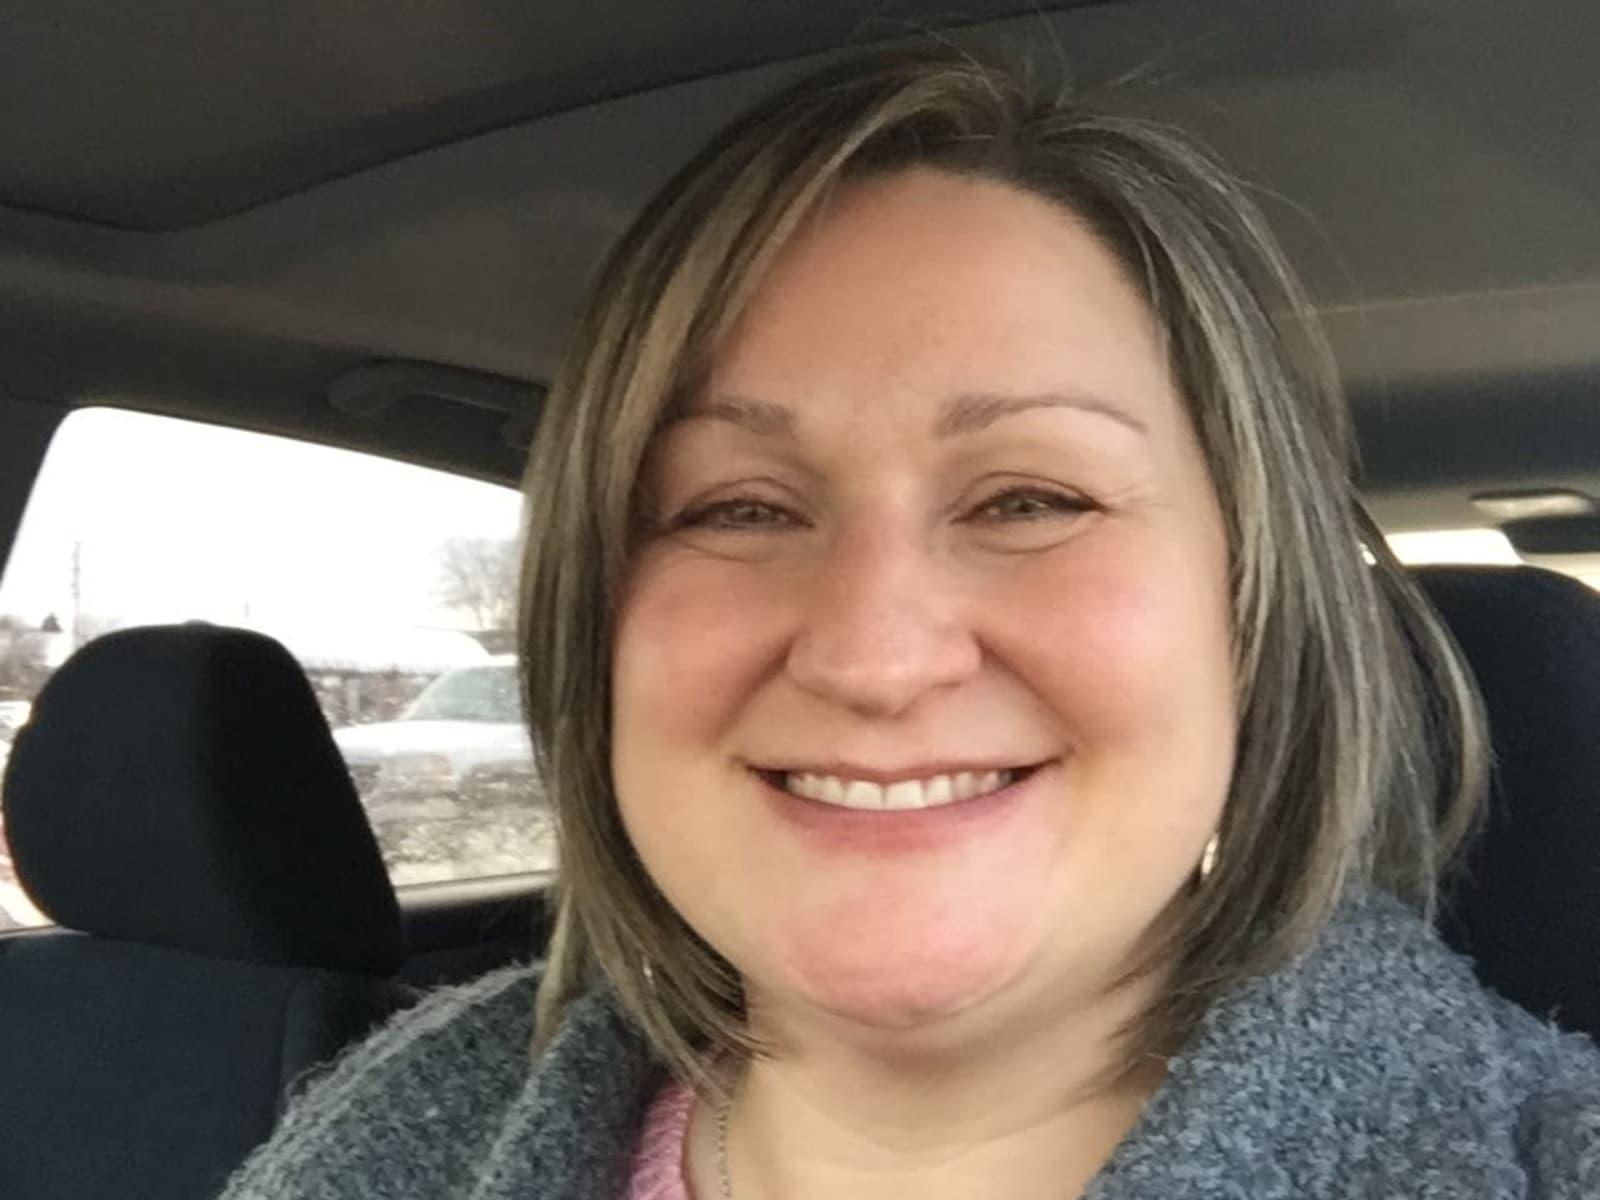 Melanie from Guelph, Ontario, Canada